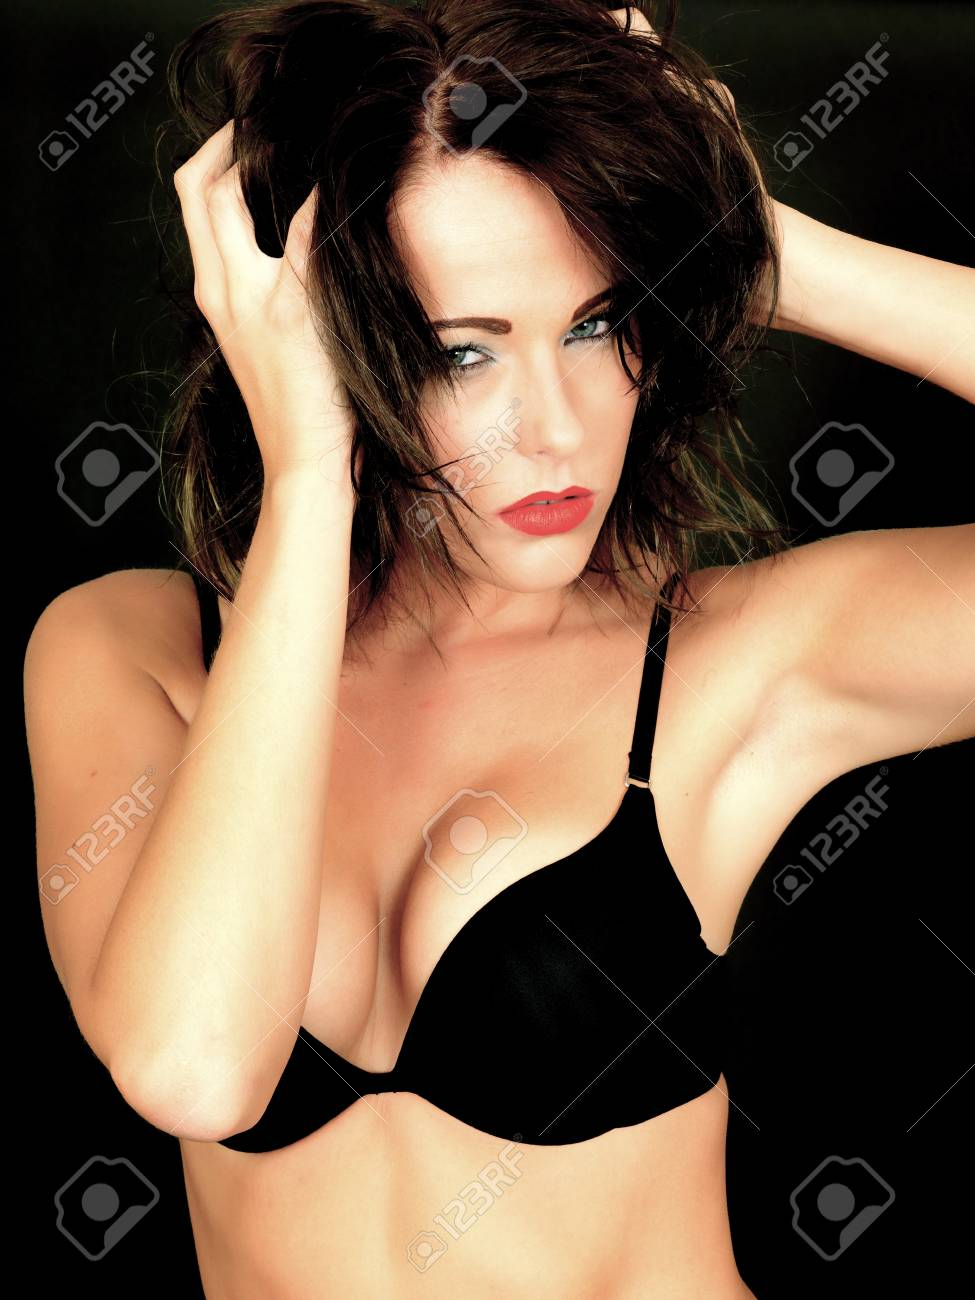 63ca7b69cb402 Sexy Young Woman Wearing Black Bra Stock Photo - 30544592